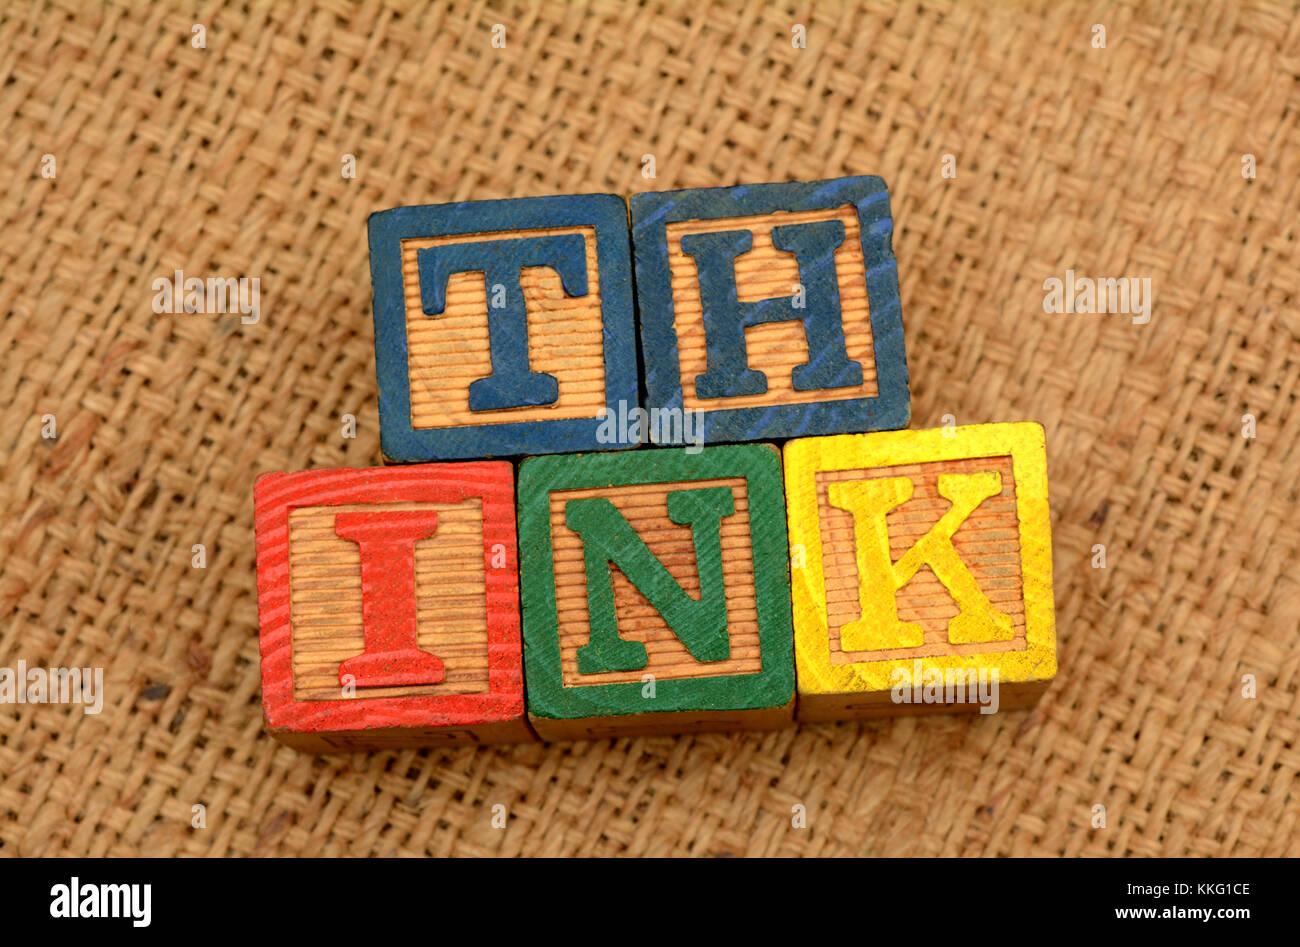 Think word on wood blocks - thinking concept - Stock Image